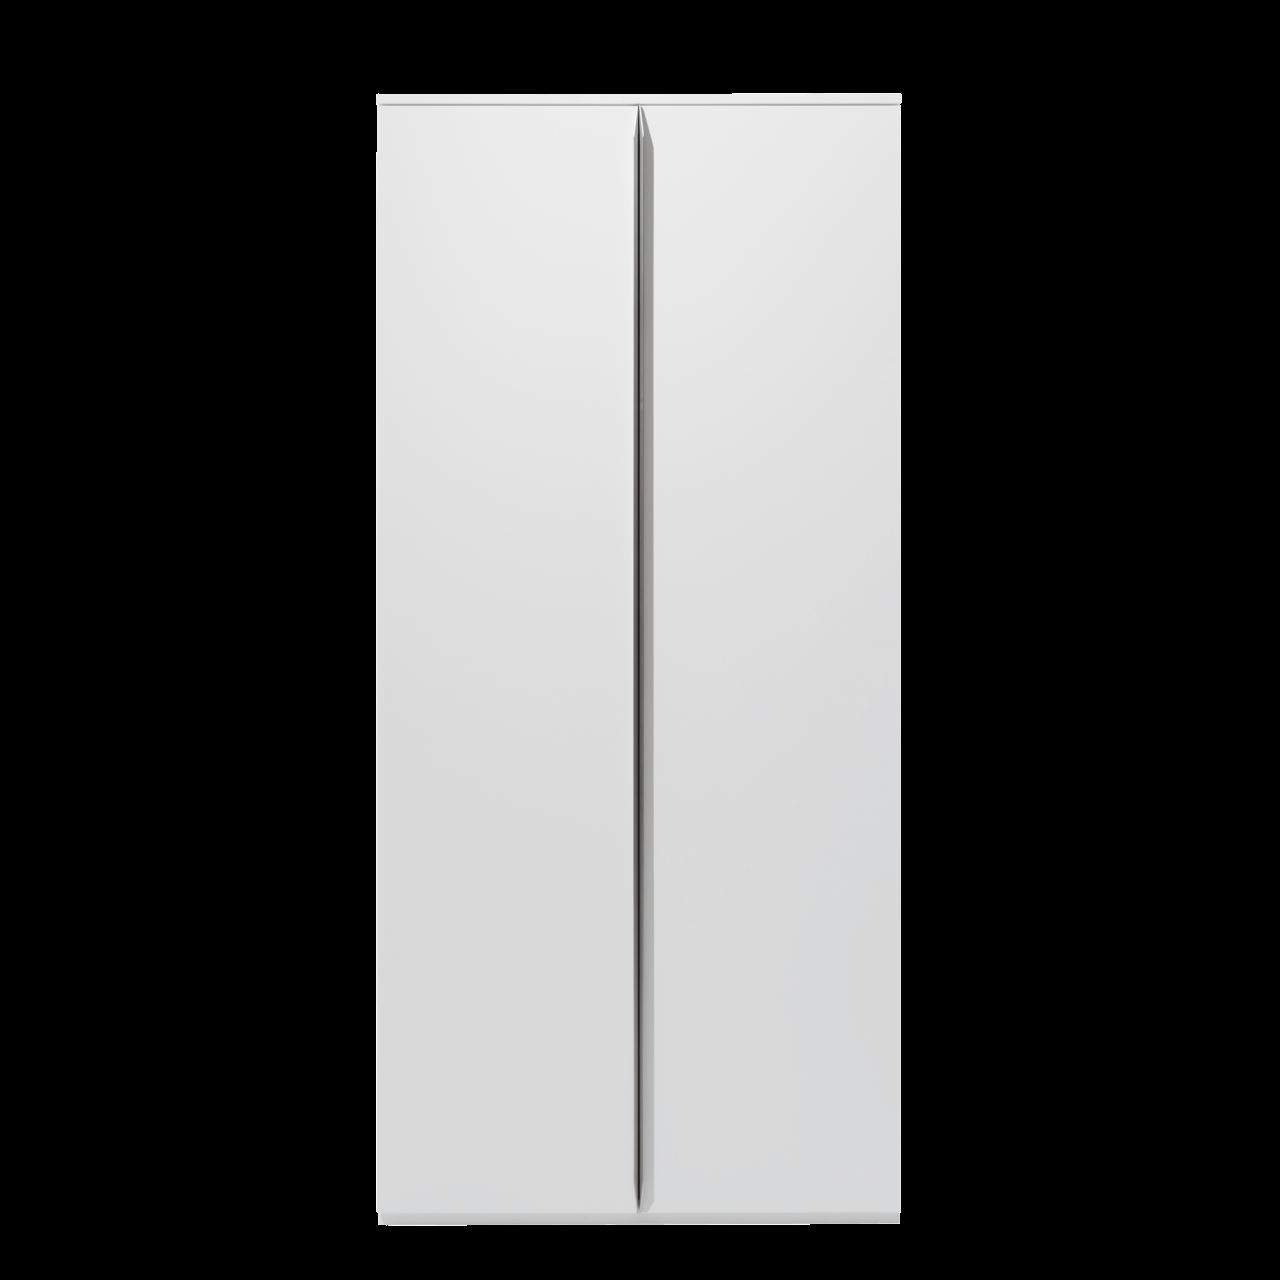 Modular 16 Kleiderschrank